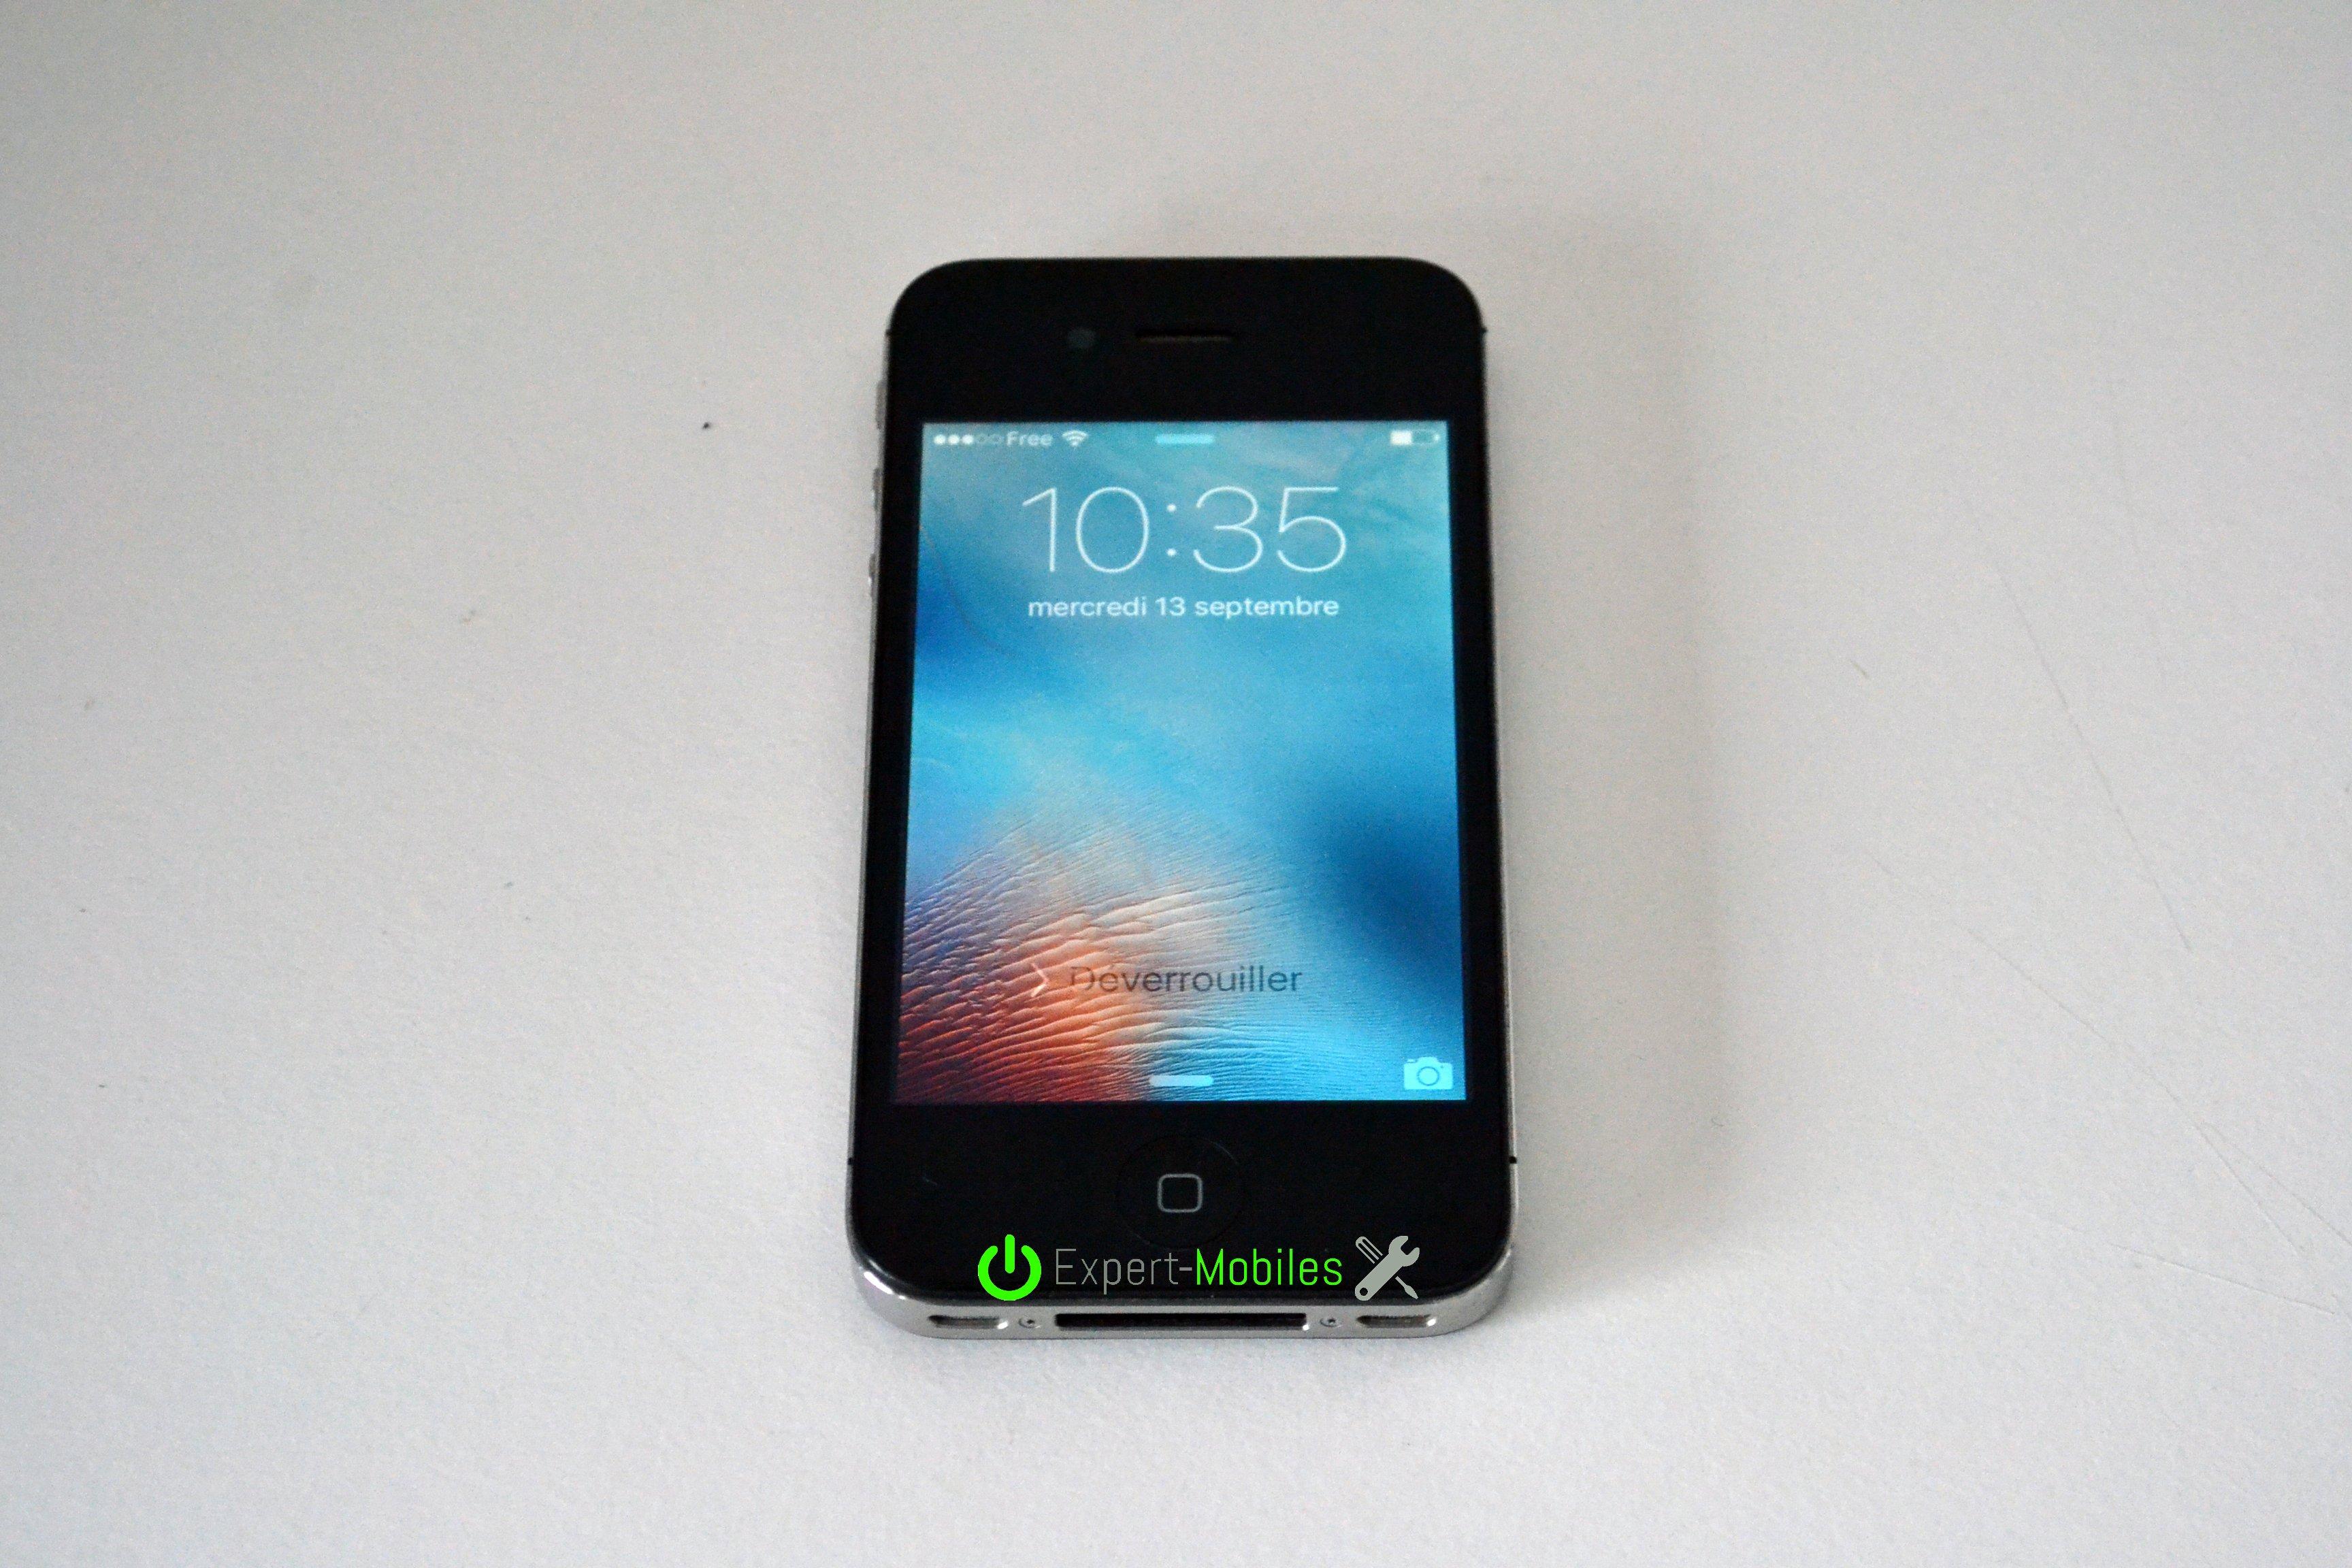 Iphone 4s 16 go imei013187006690846 em 2 expert mobiles - Reparation telephone lorient ...